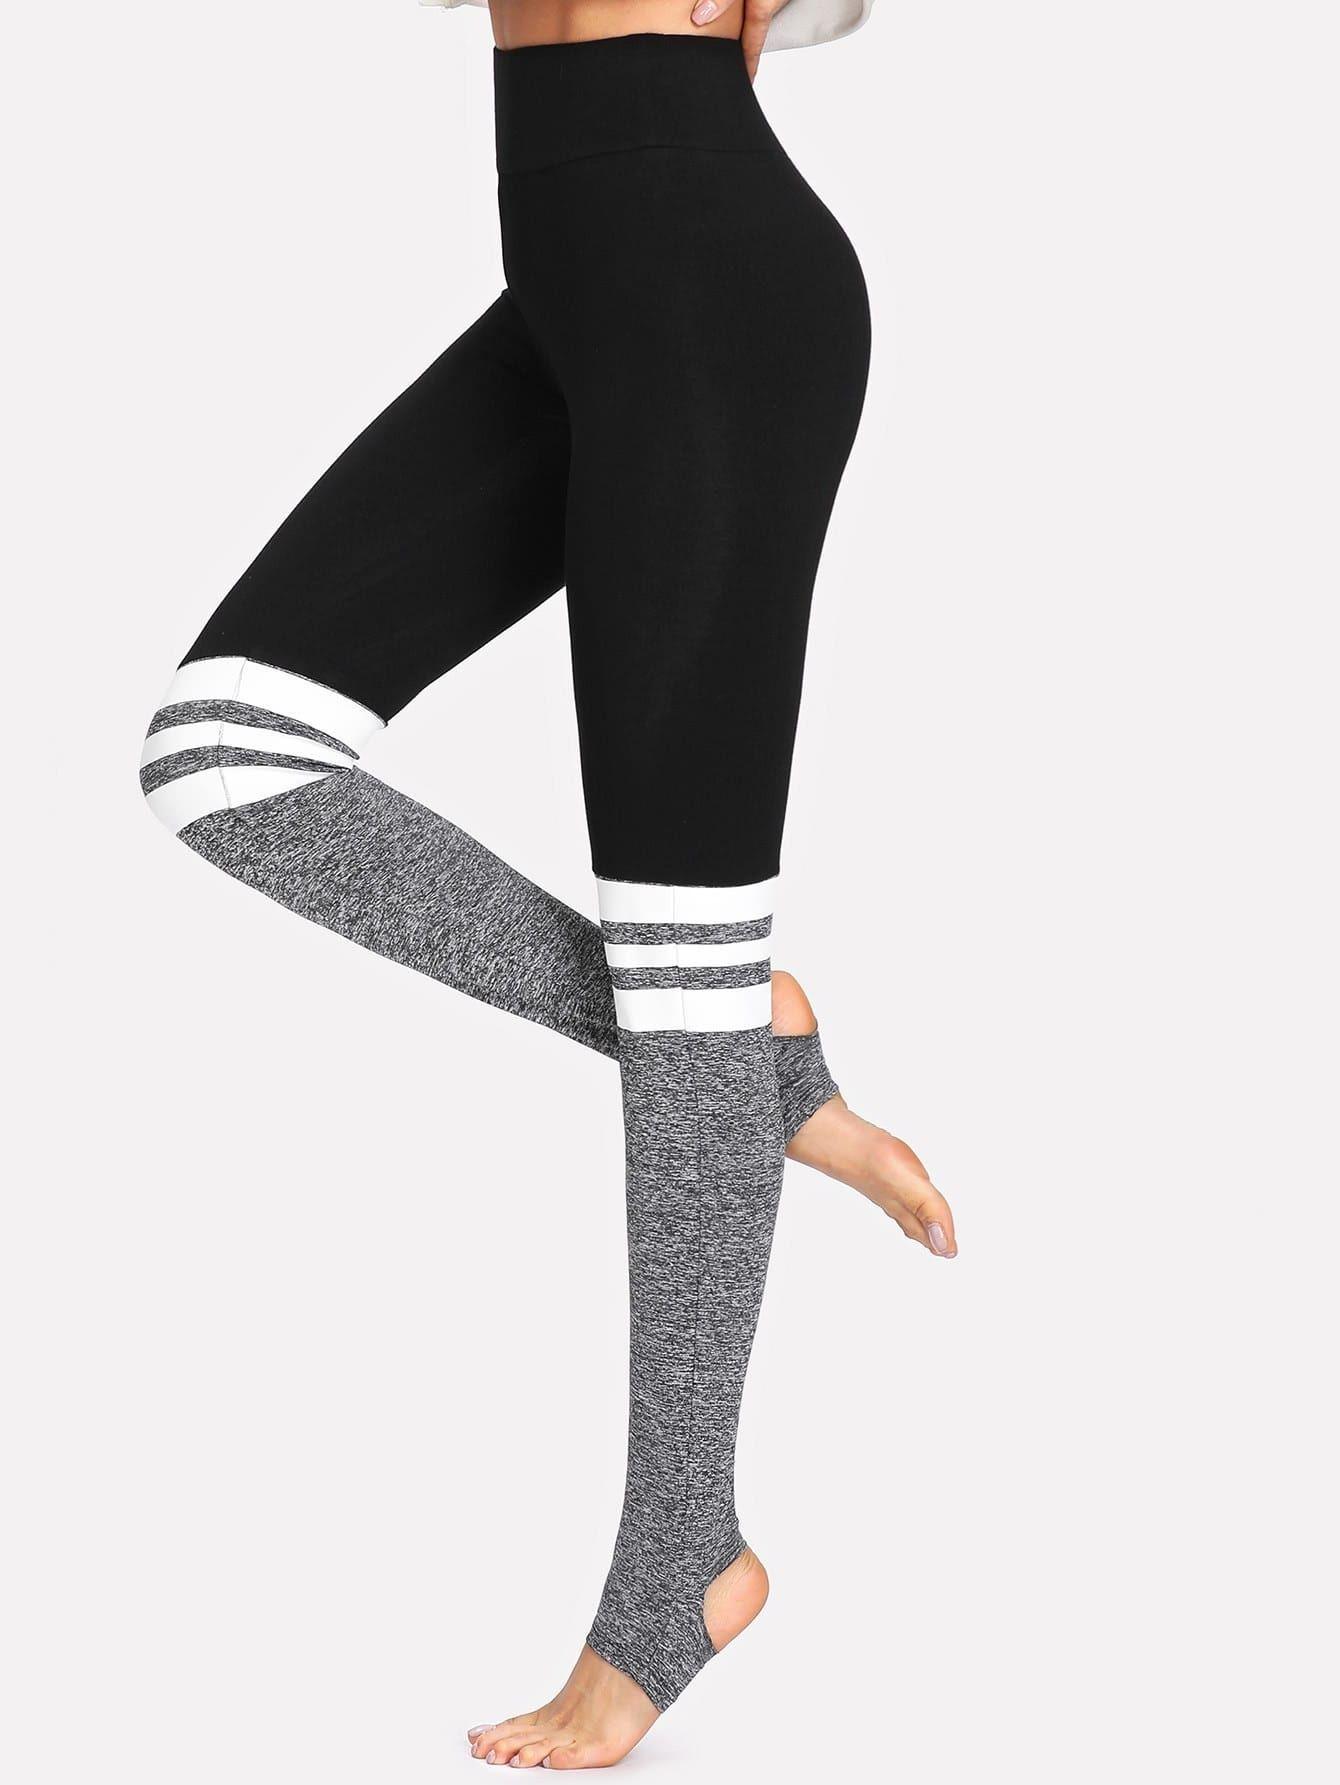 Damen Fitness Leggings Leggins Trainings Jogging Sport Gym Tights Hose Farbblock